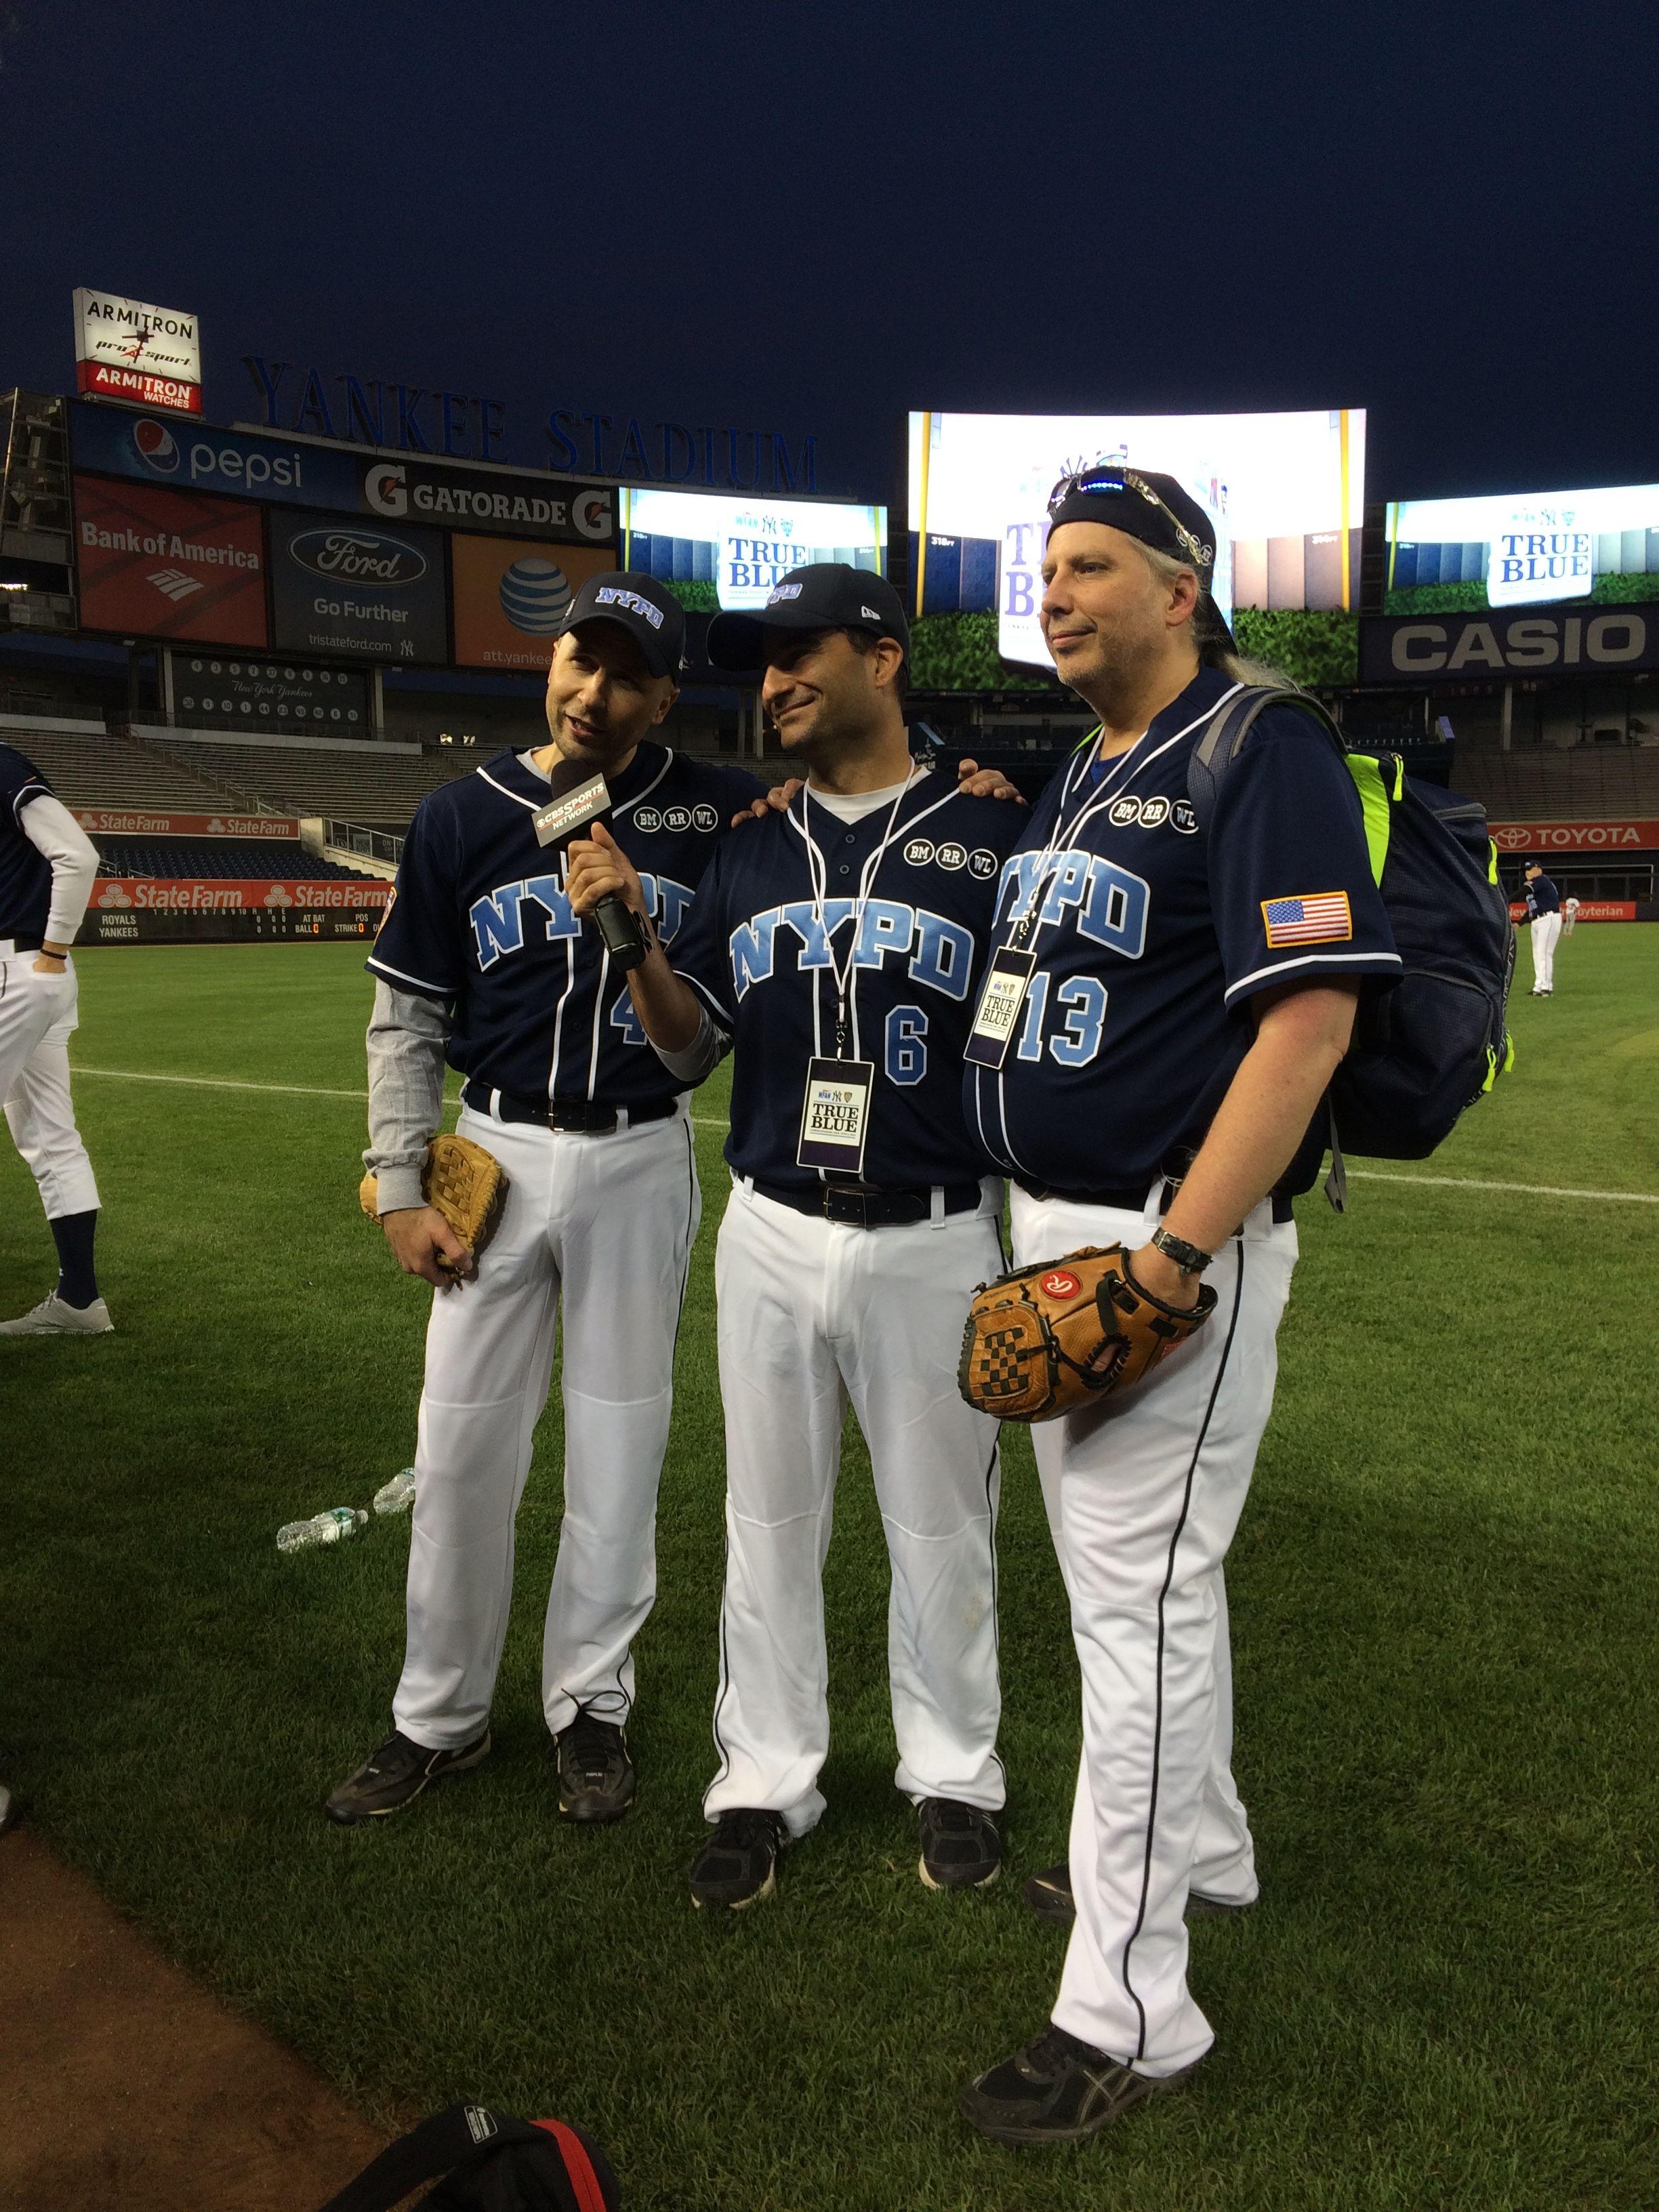 Wfan Staff Poses For A Picture Trueblue Nypd Boomerandcarton Hipnj Hipnjevent True Blue Softball Jersey